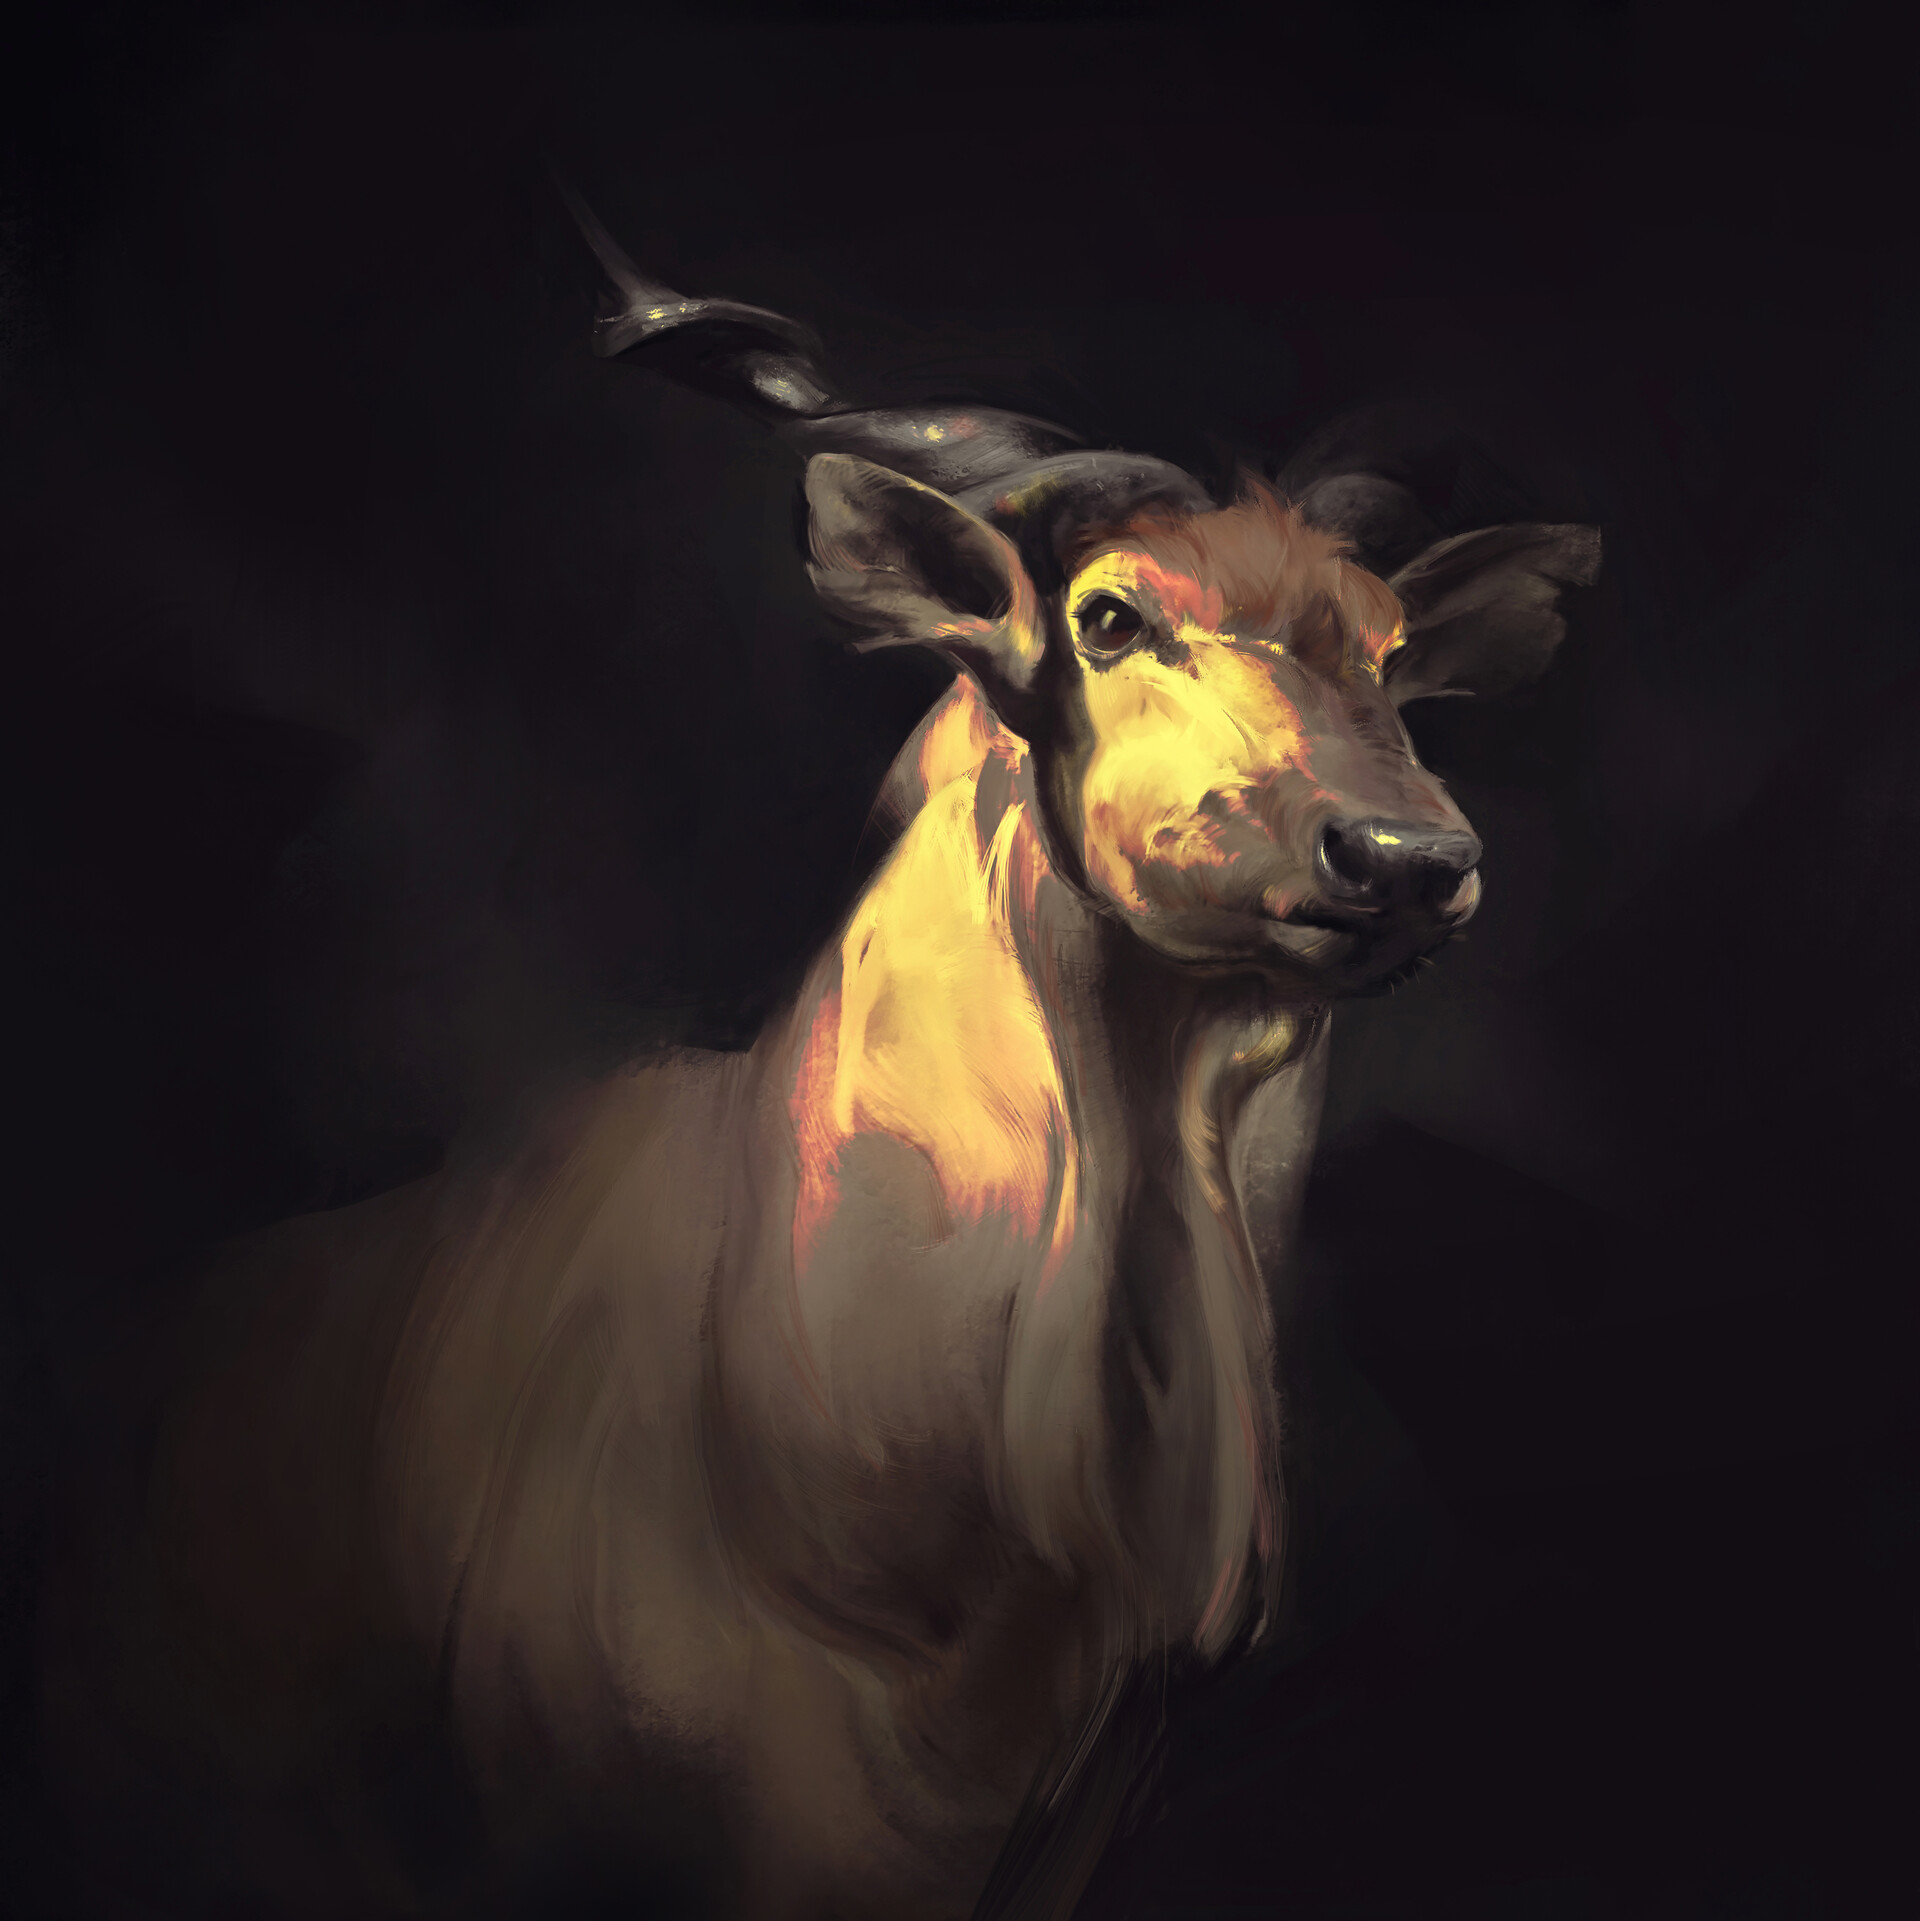 arash-razavi-deer-friend